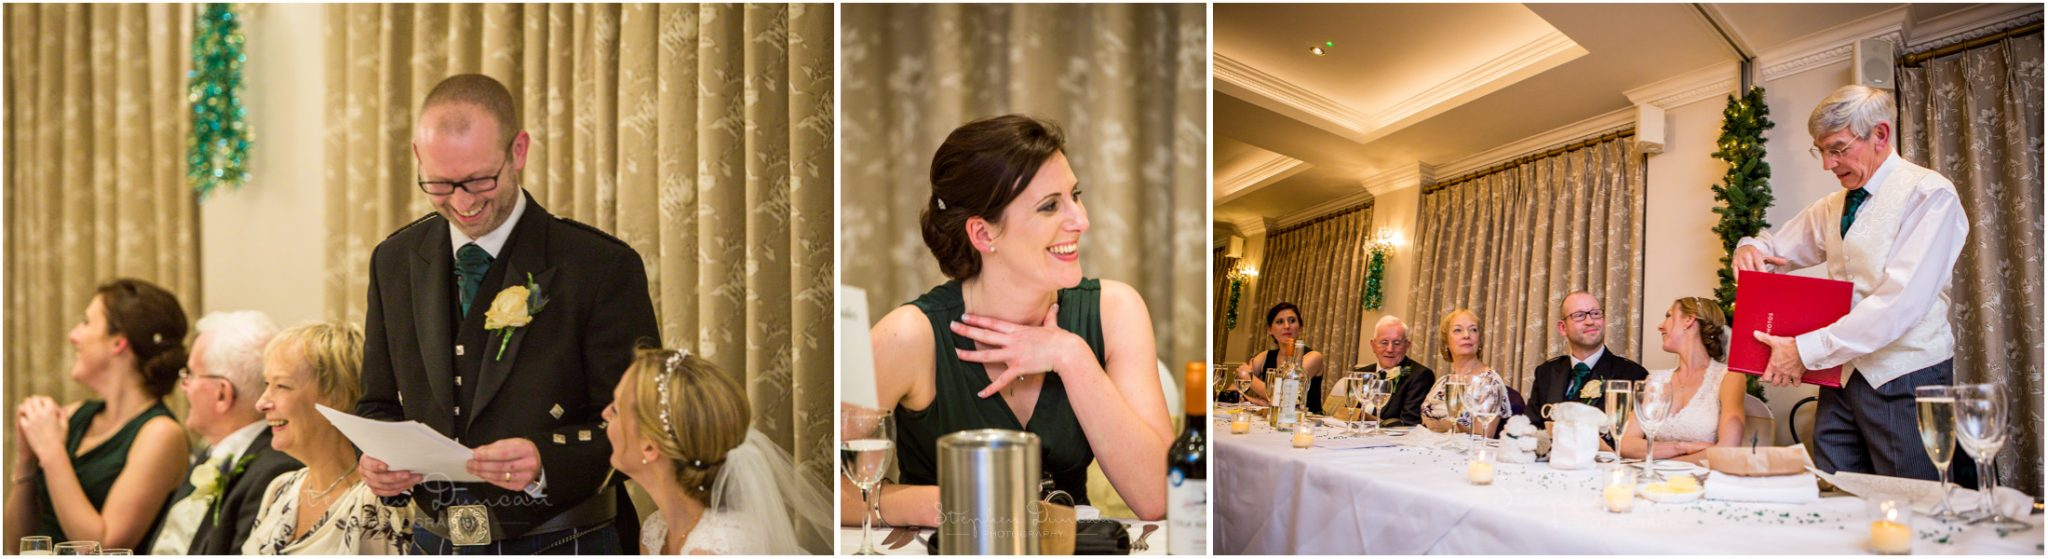 Romsey Abbey wedding photographer groom's speech